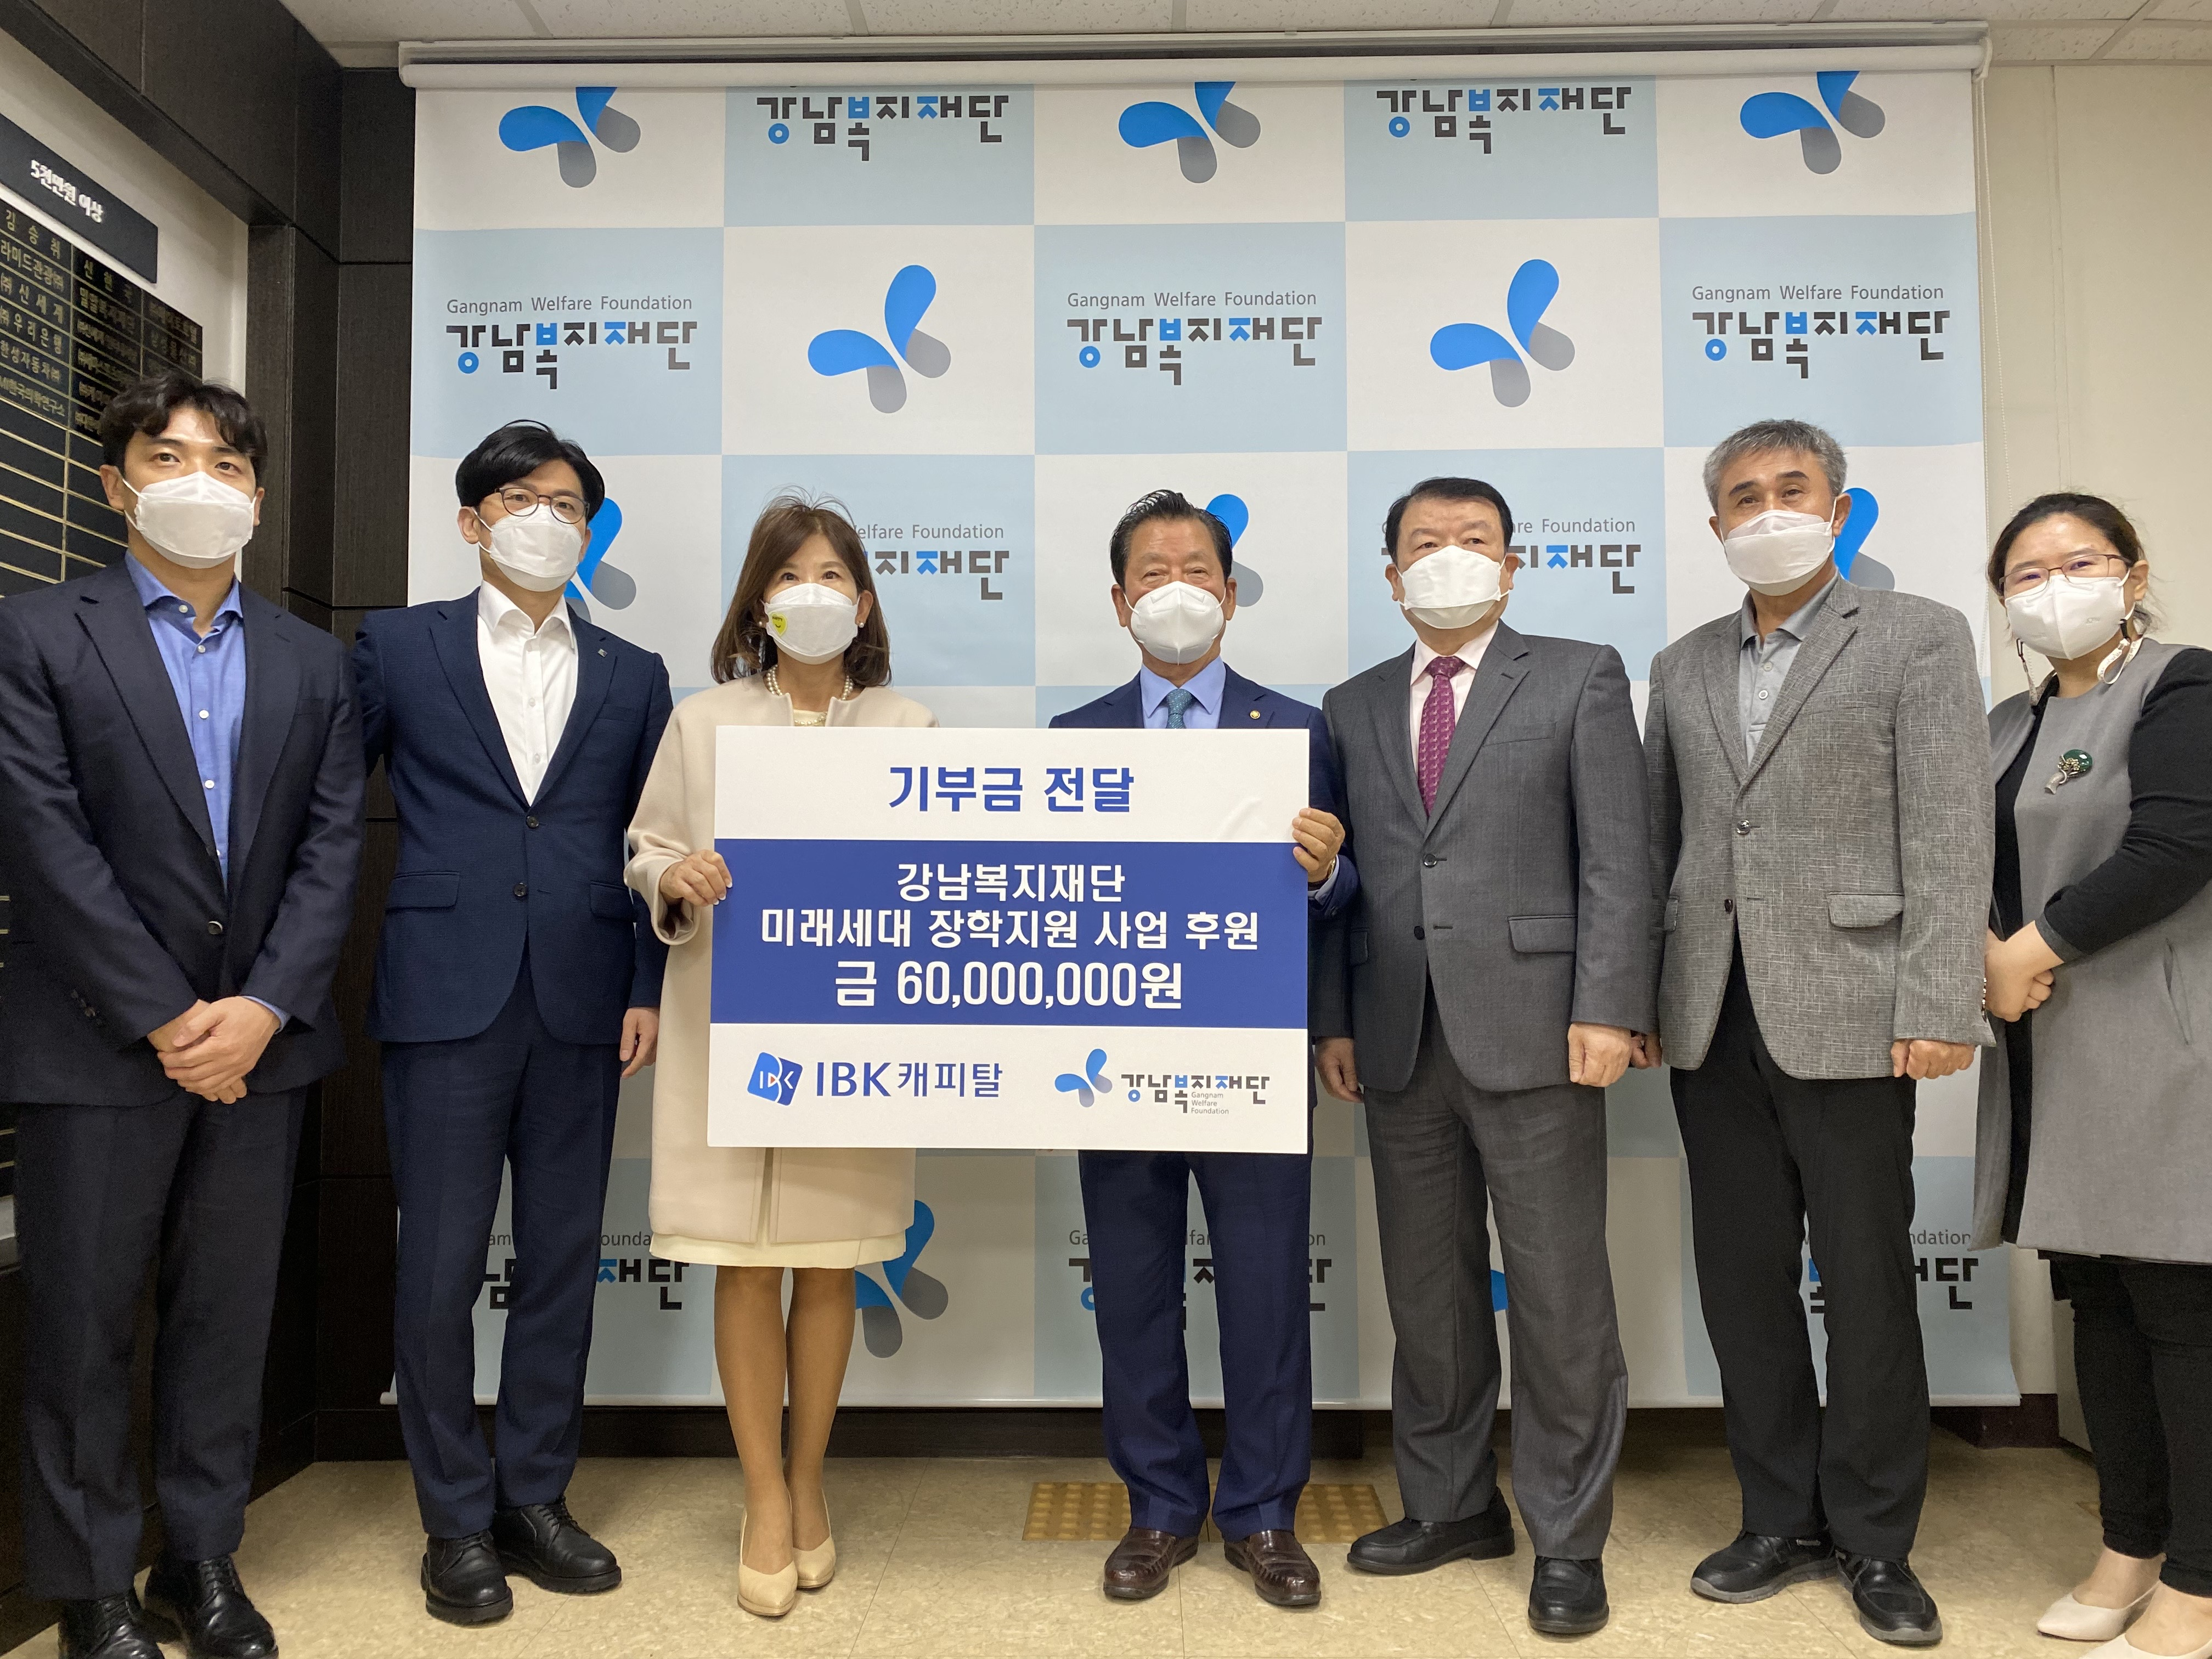 IBK캐피탈 ,강남복지재단에 청소년 장학금 기부